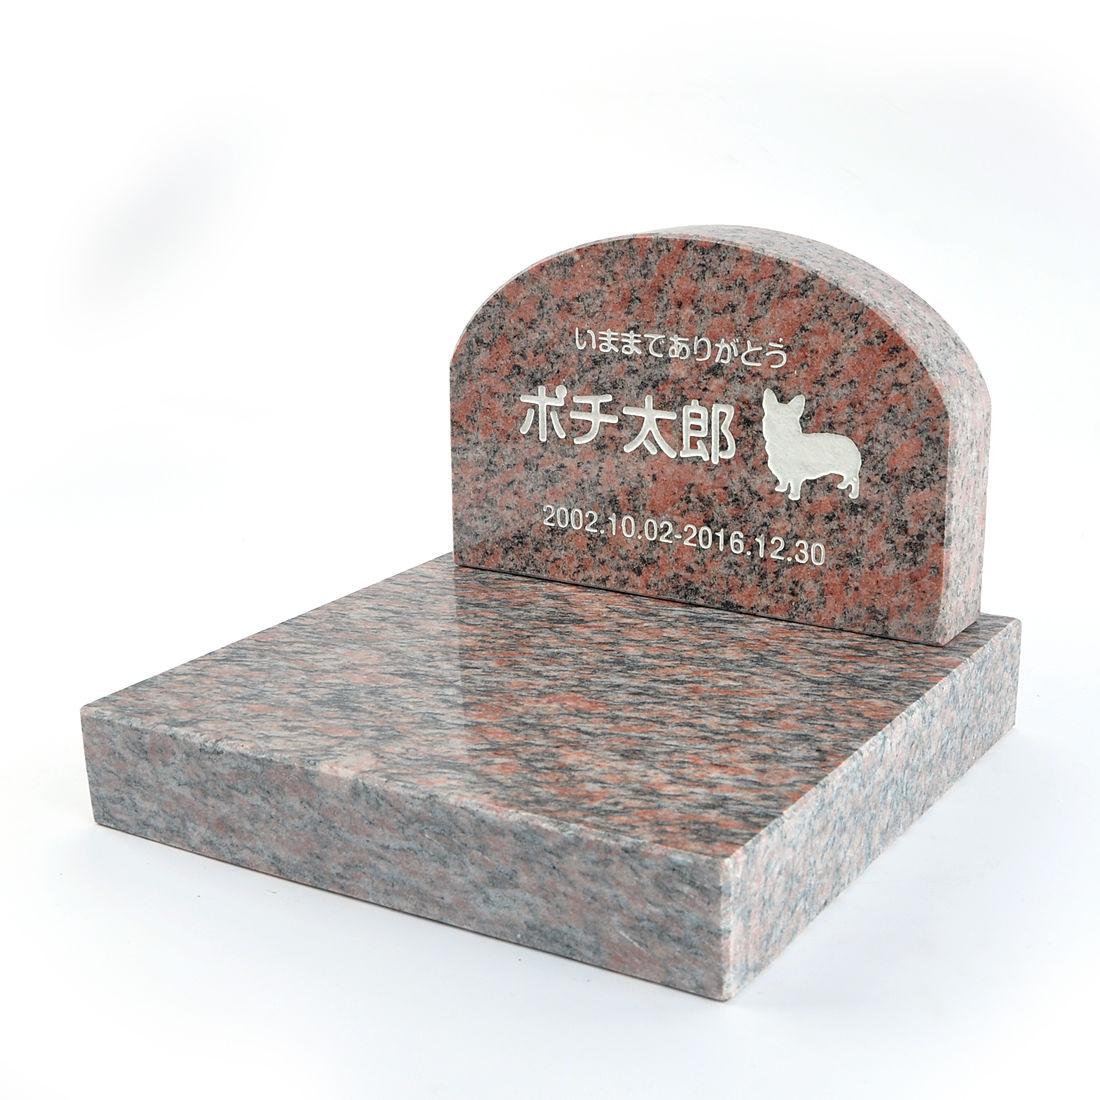 Pet&Love. ペットのお墓 天然石製 セット型 底板が厚く重いタイプ 御影石 レッド アーチ  【HLS_DU】【楽ギフ_名入れ】 attr177attr ctgr2ctgr sml3sml+ctgr2ctgr DOG